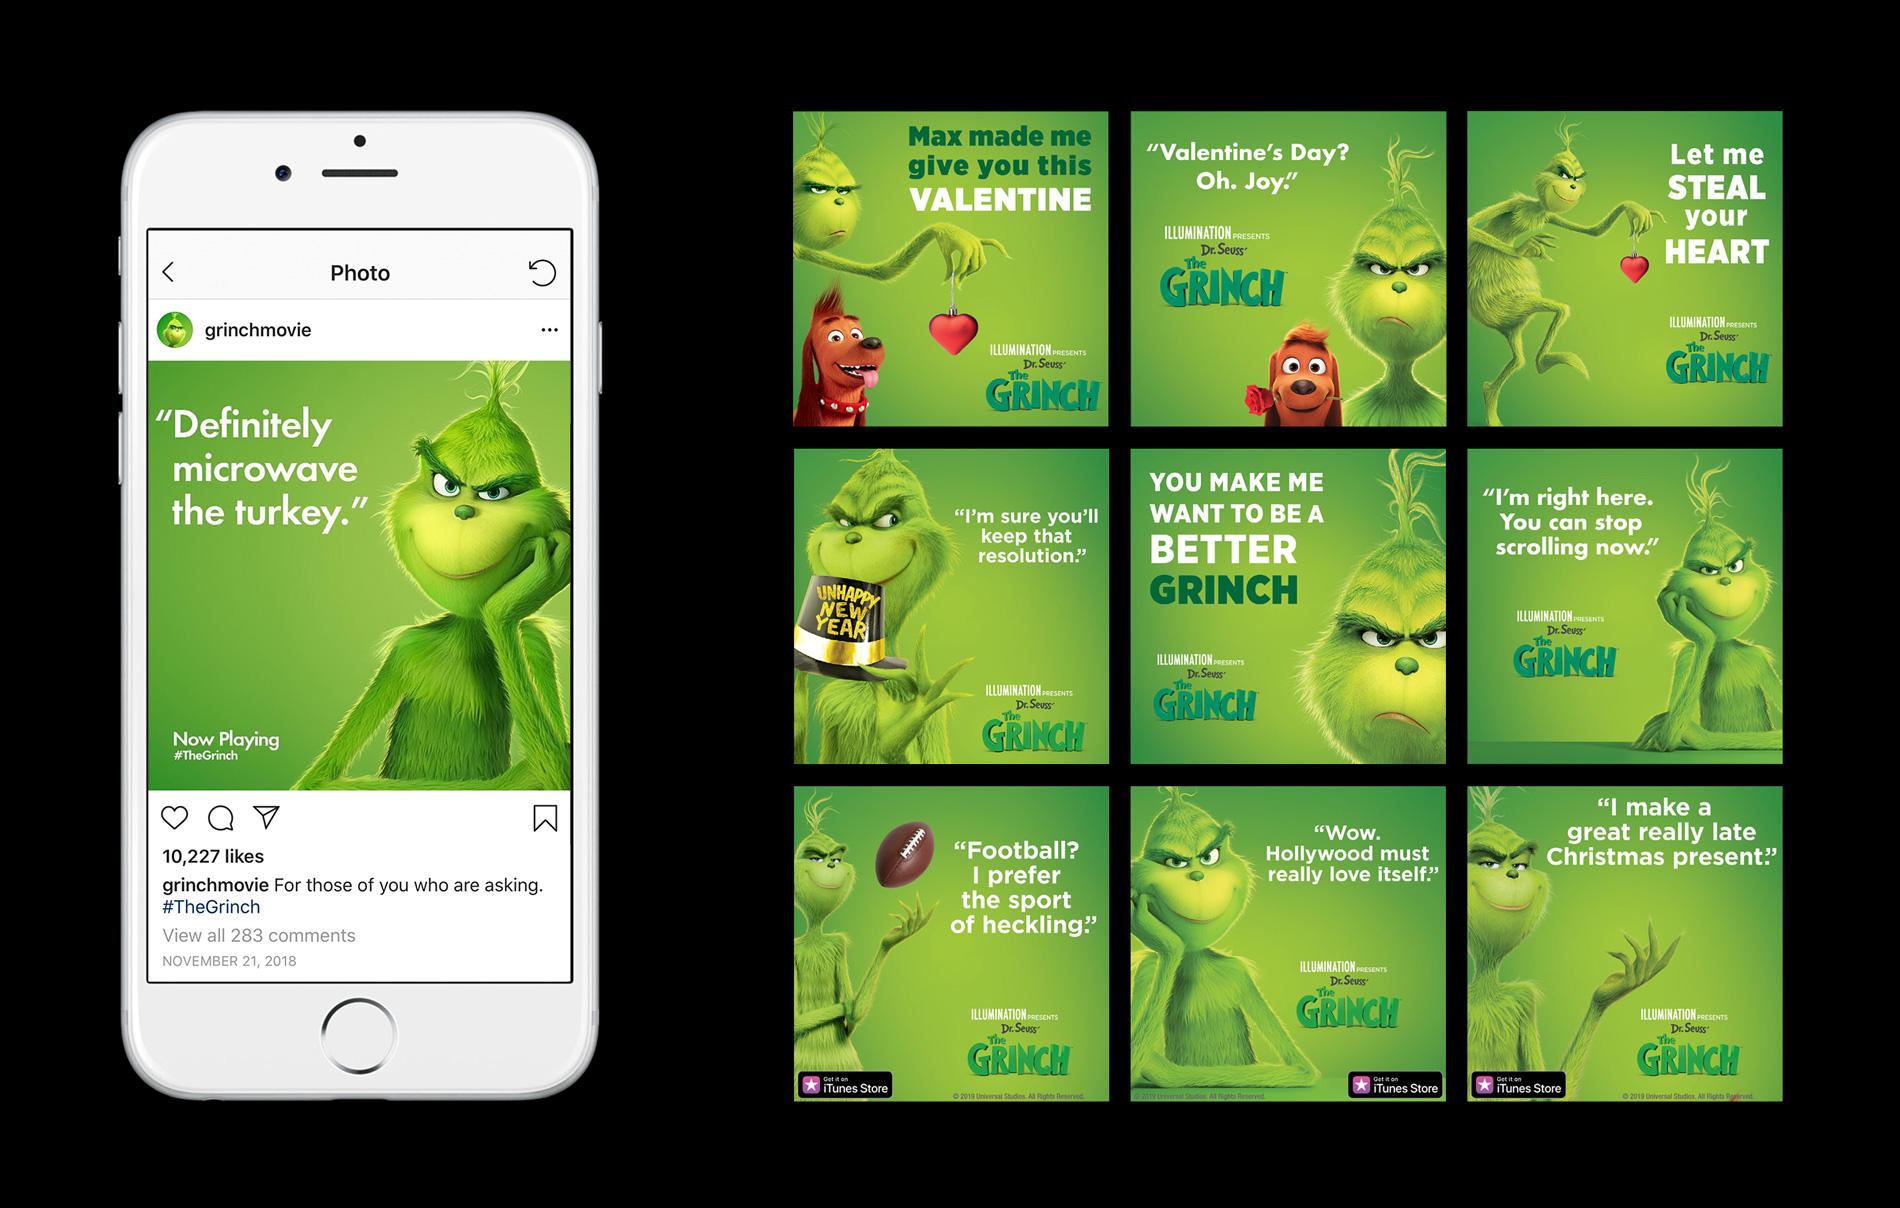 Grinch_SocialMedia.jpg